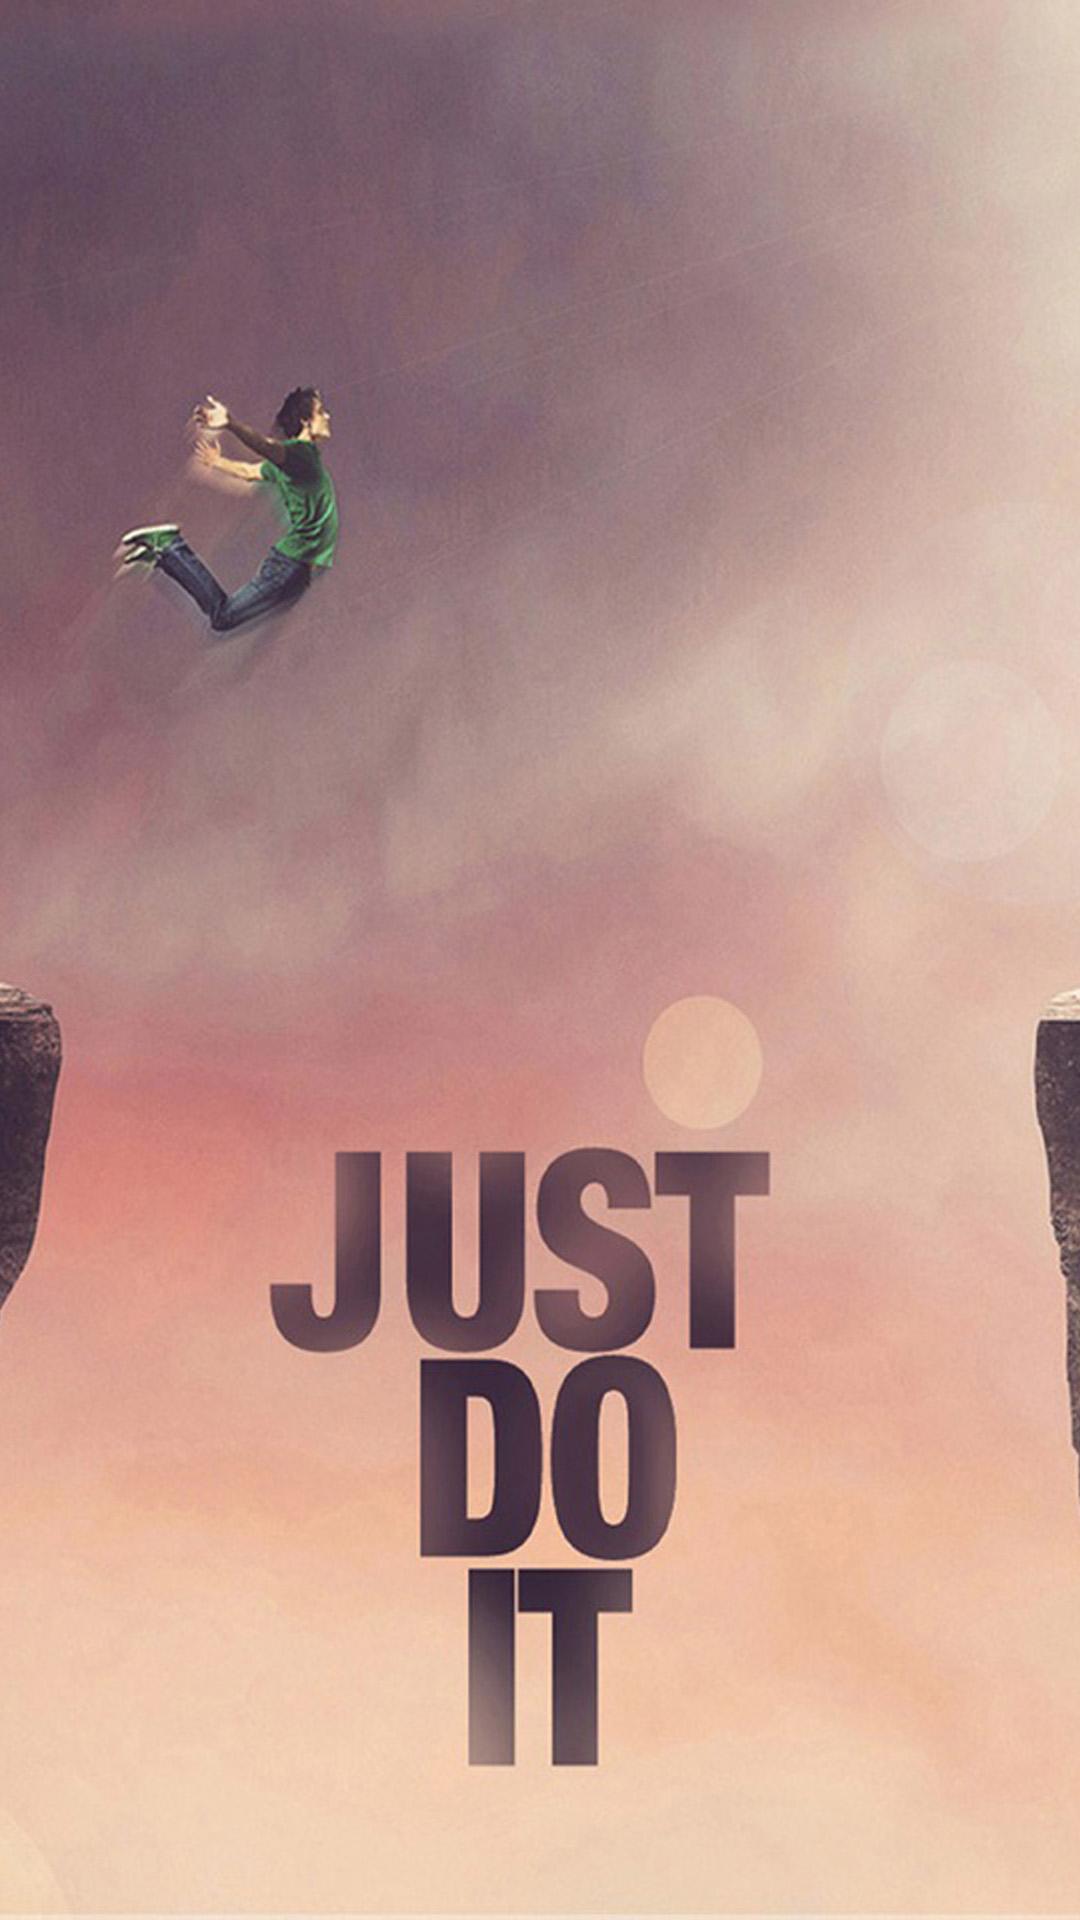 Just Do It Tomorrow Wallpaper